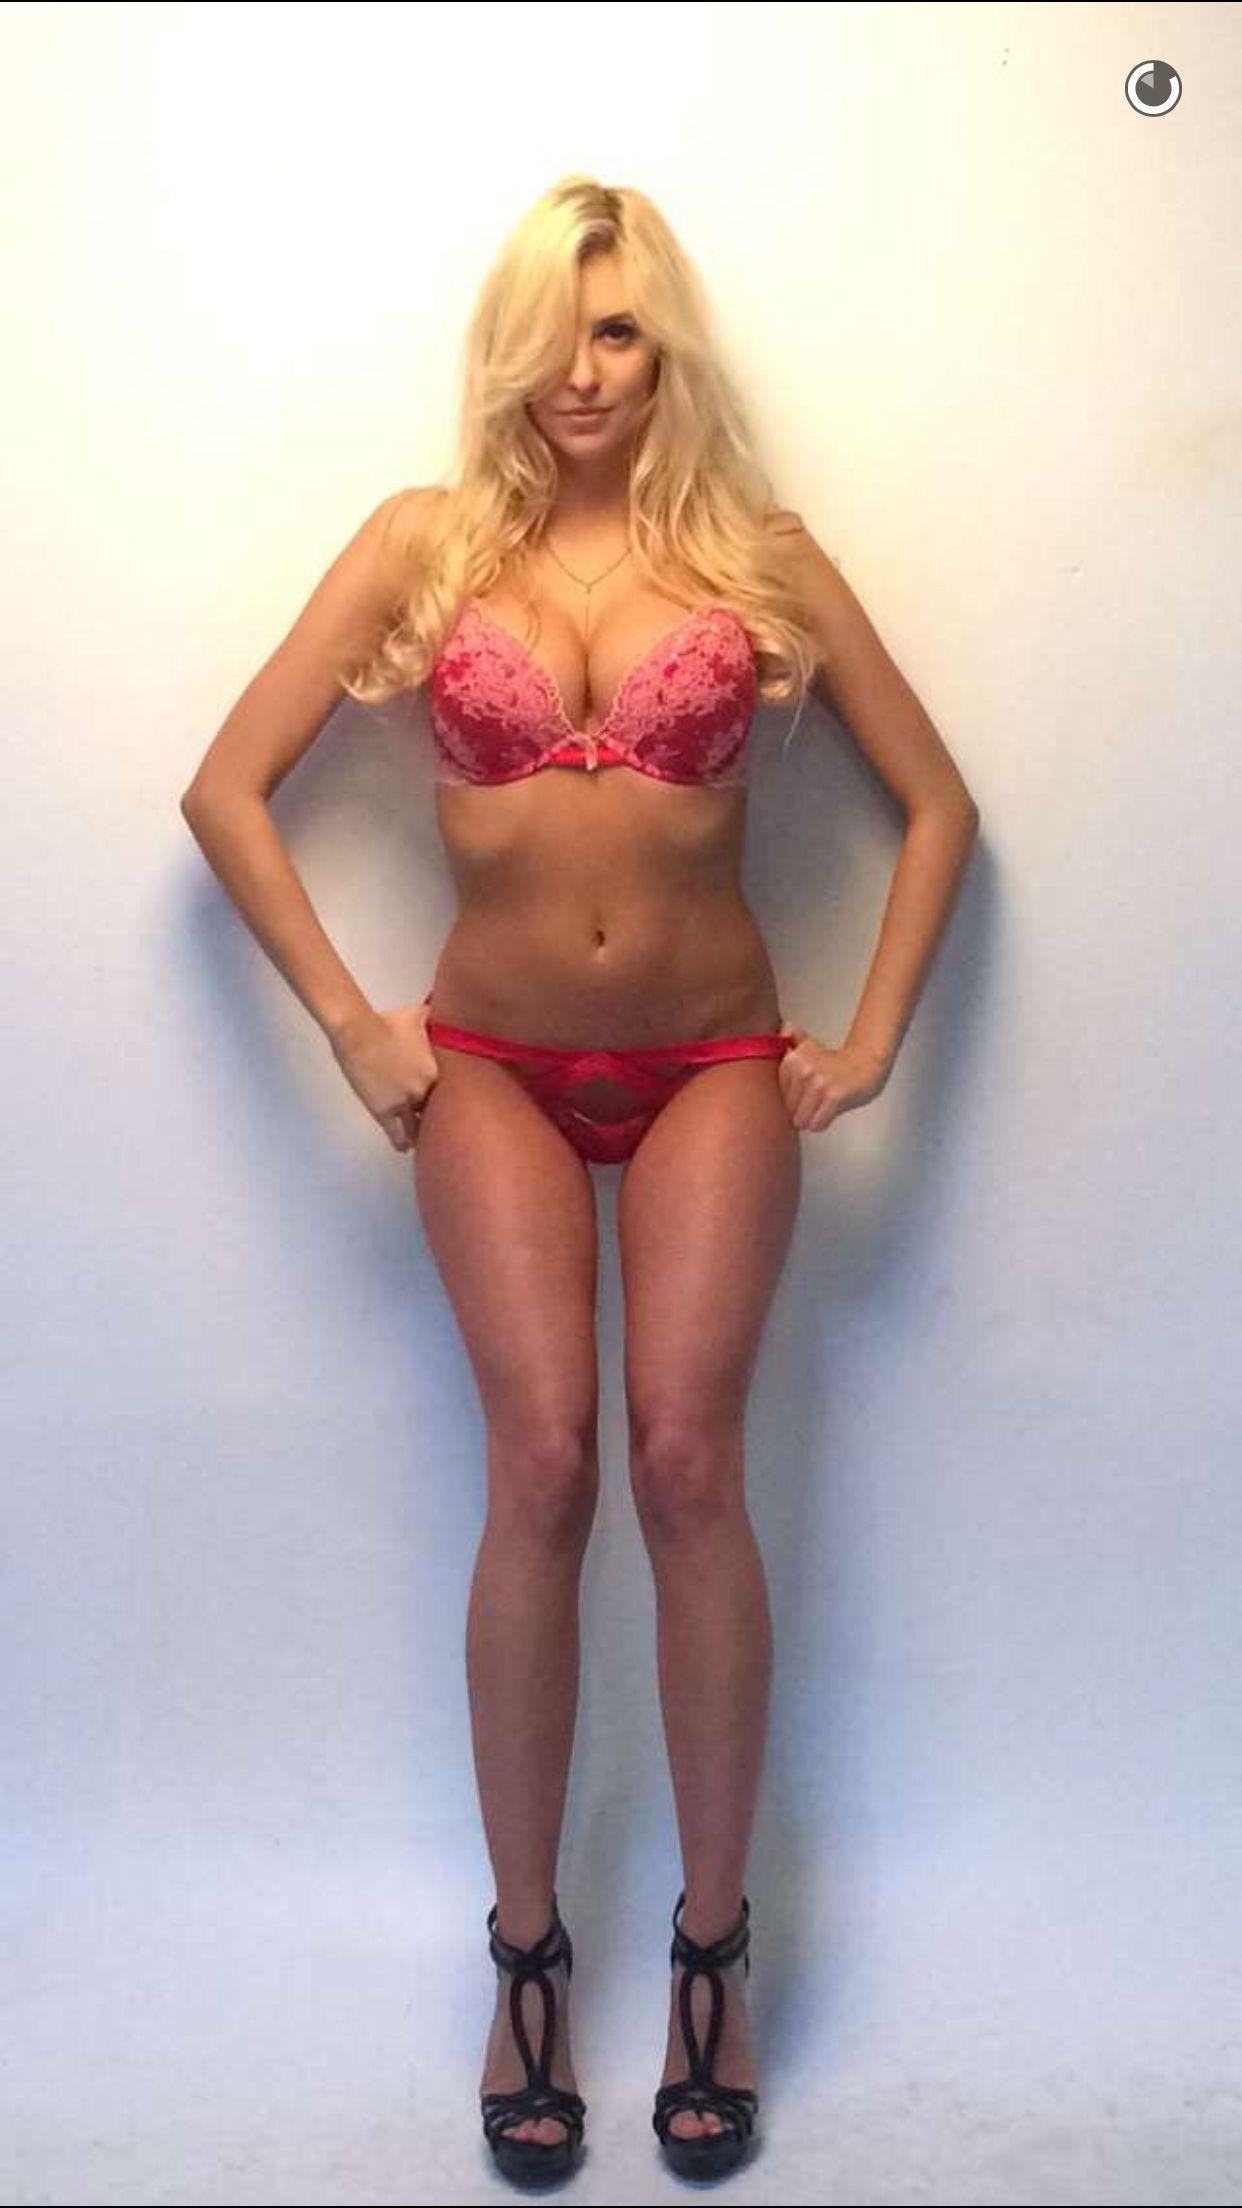 2019 Bri Teresi naked (96 photo), Topless, Paparazzi, Twitter, panties 2006